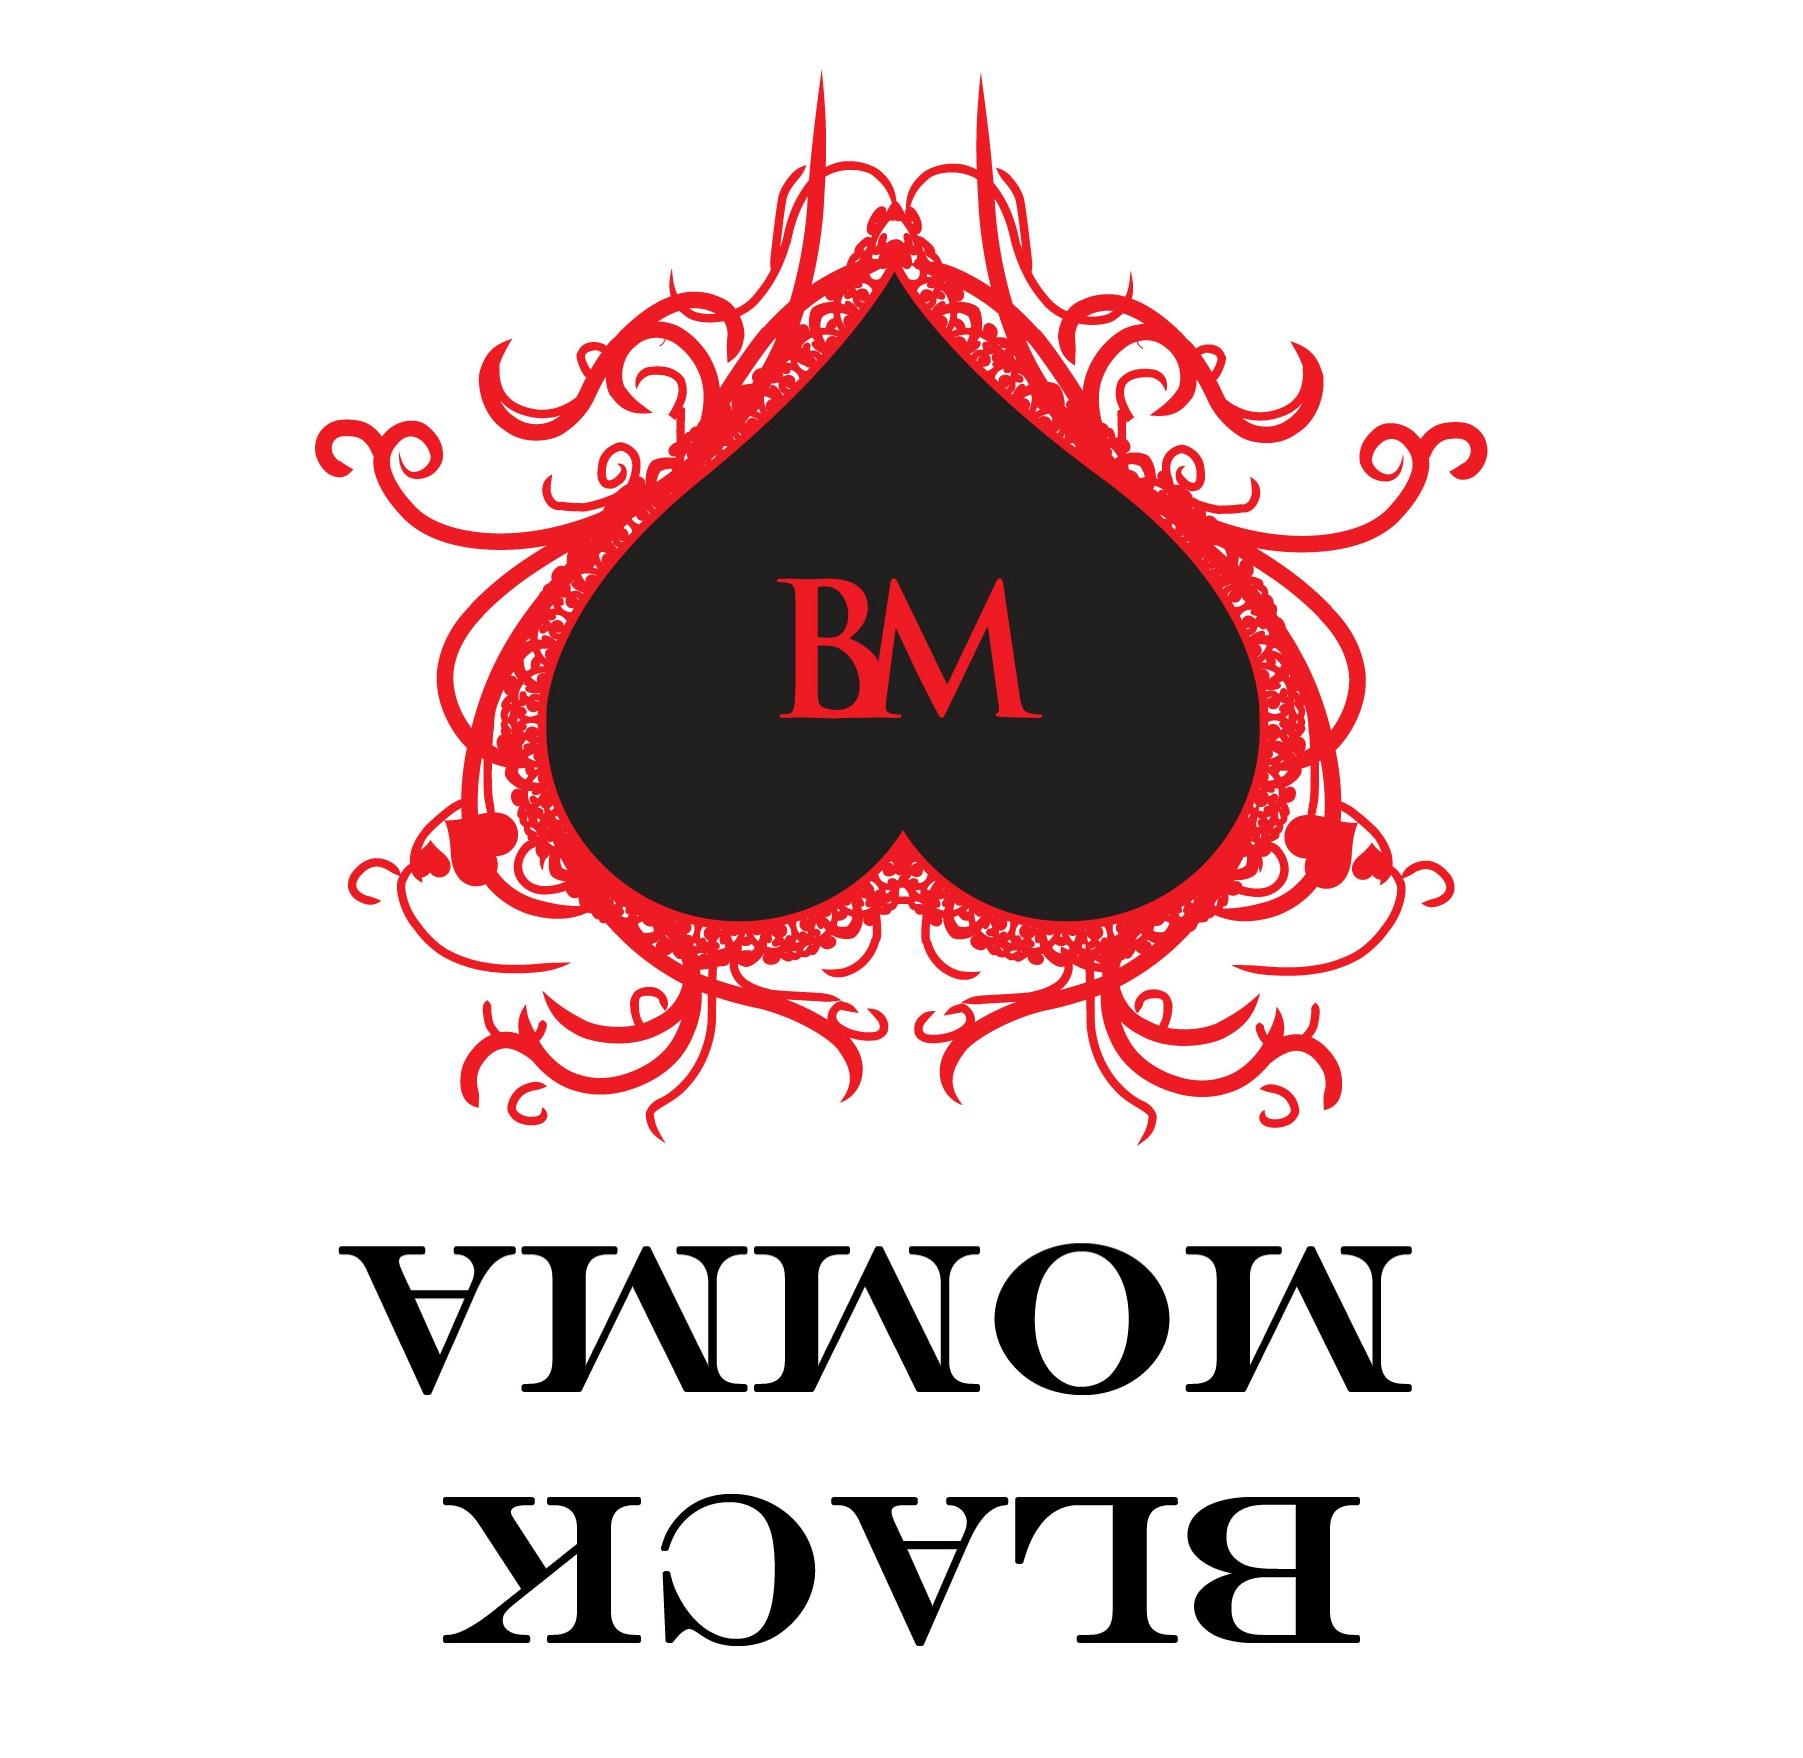 blackmomma-logo-1803-x-1758.jpg